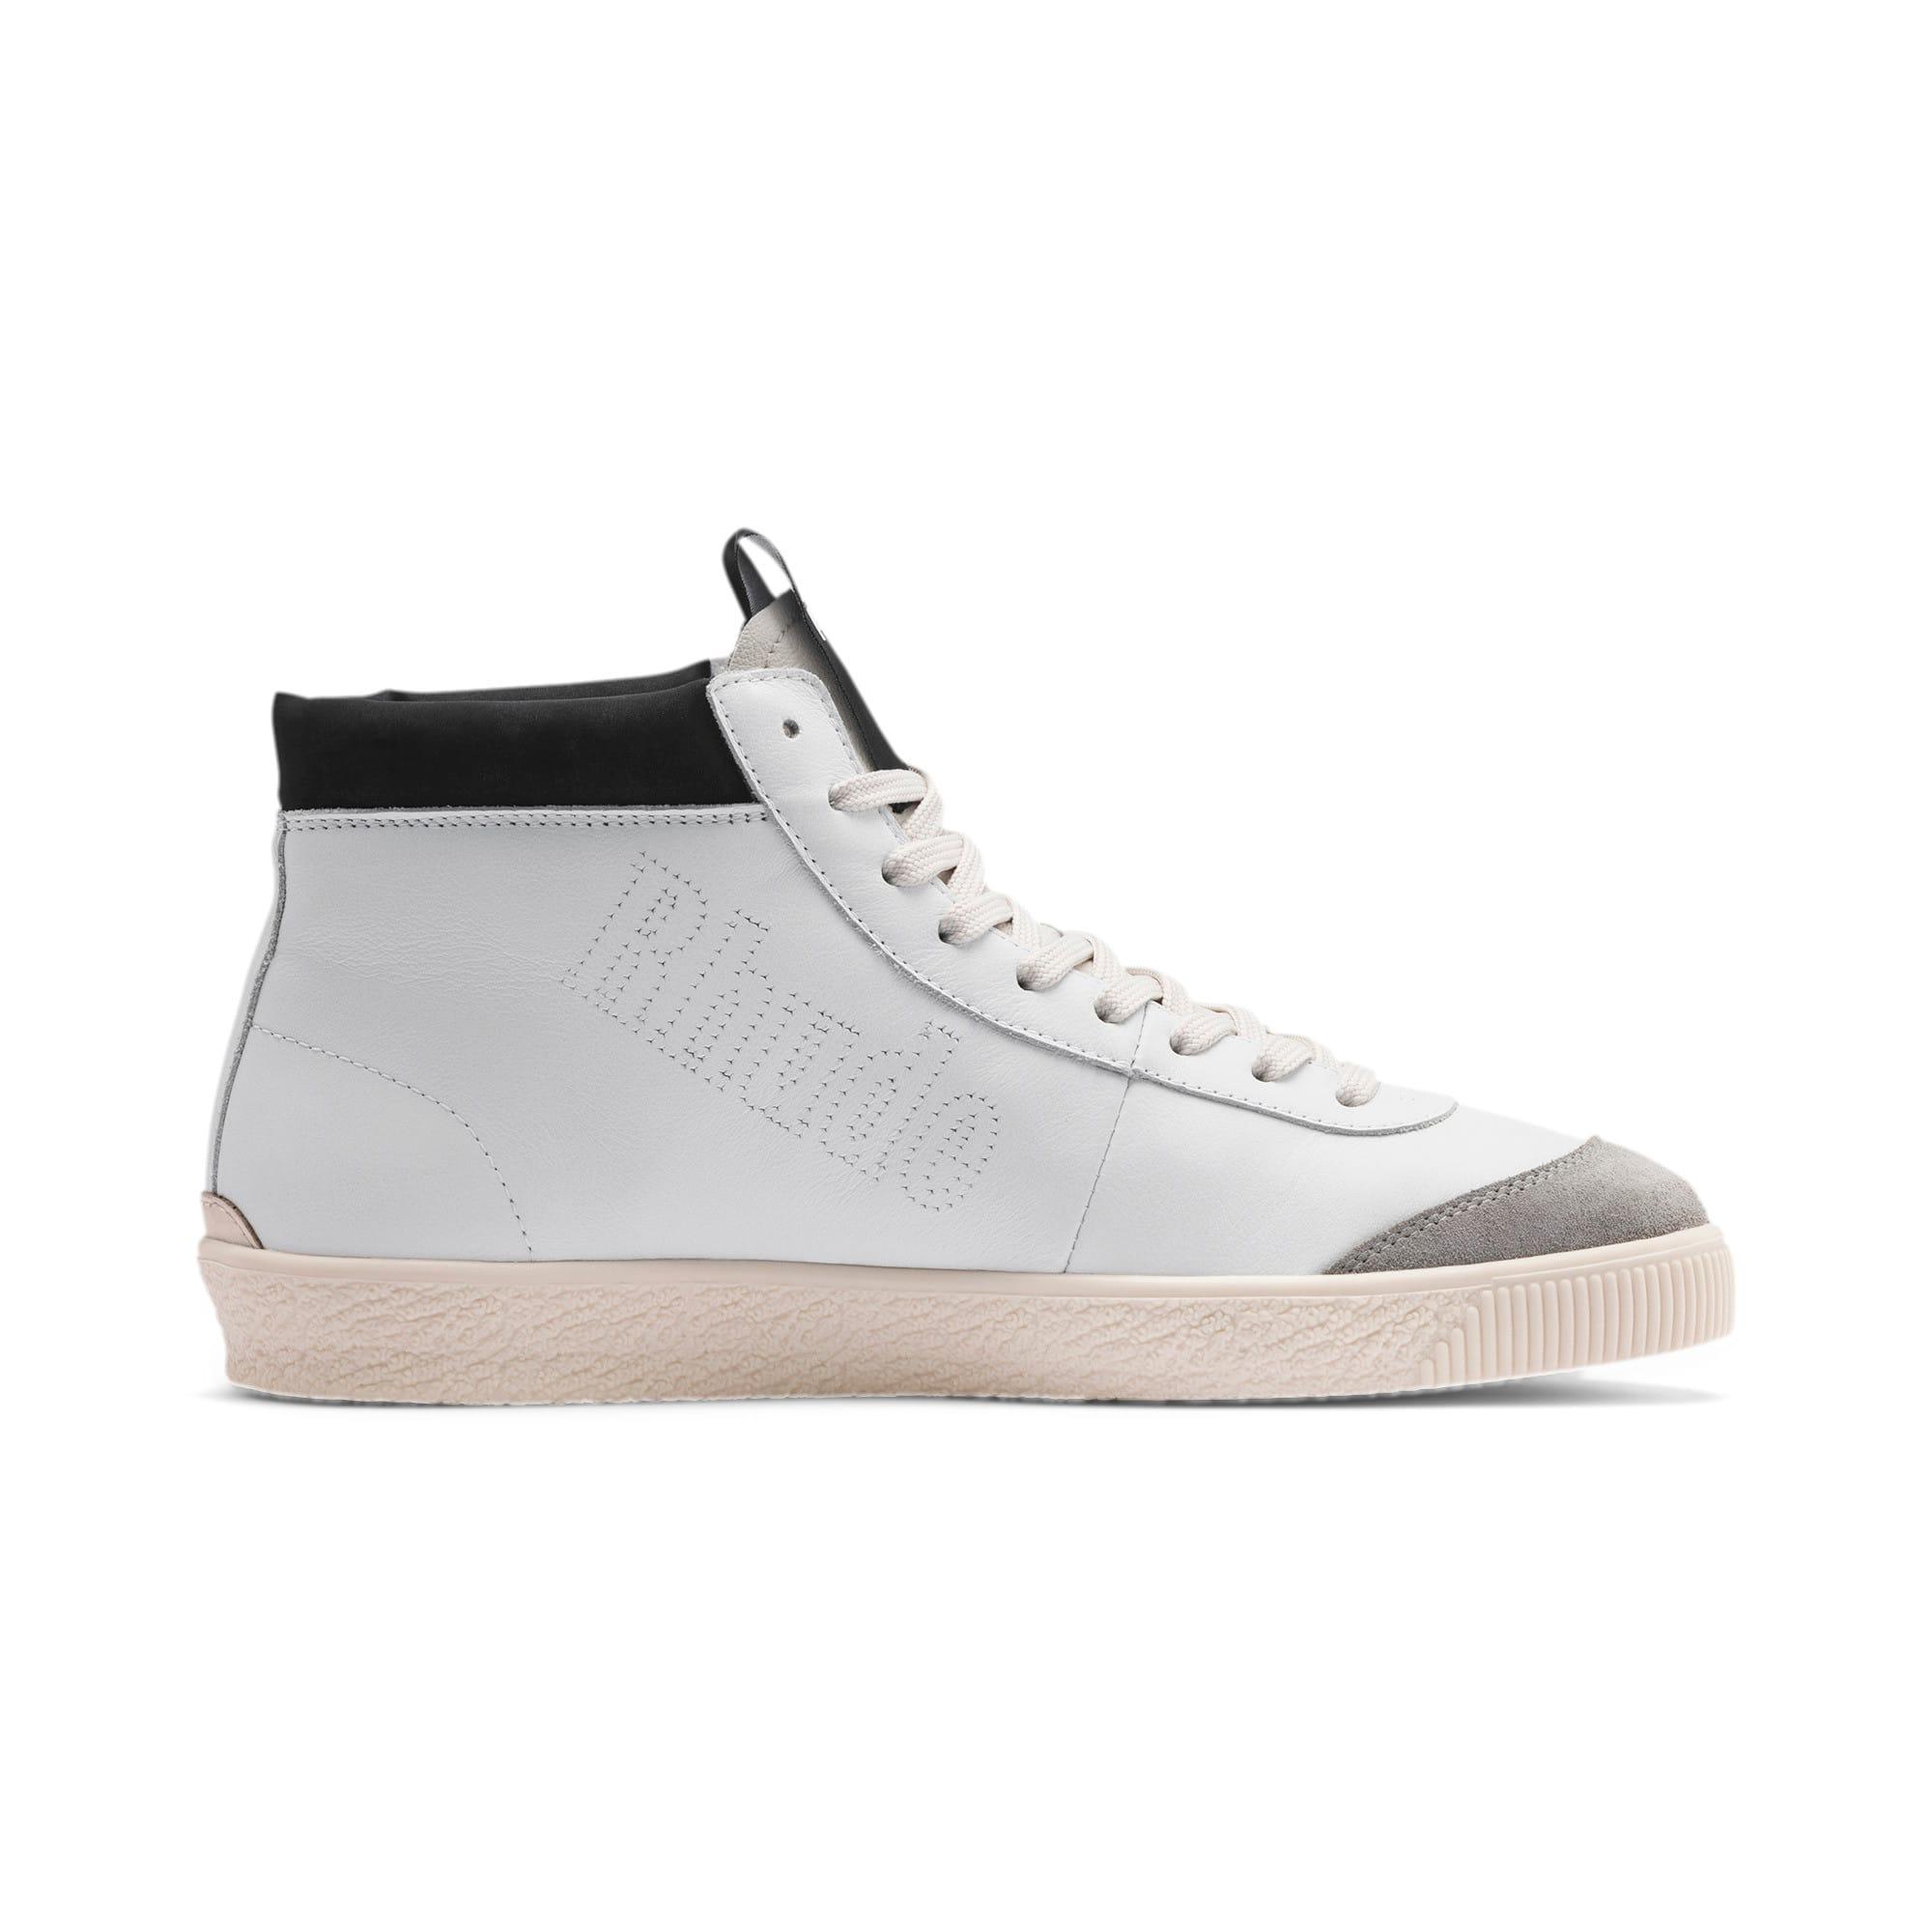 Thumbnail 5 of PUMA x RHUDE Basket '68 OG Mid Sneakers, Blanc de Blanc-Drizzle, medium